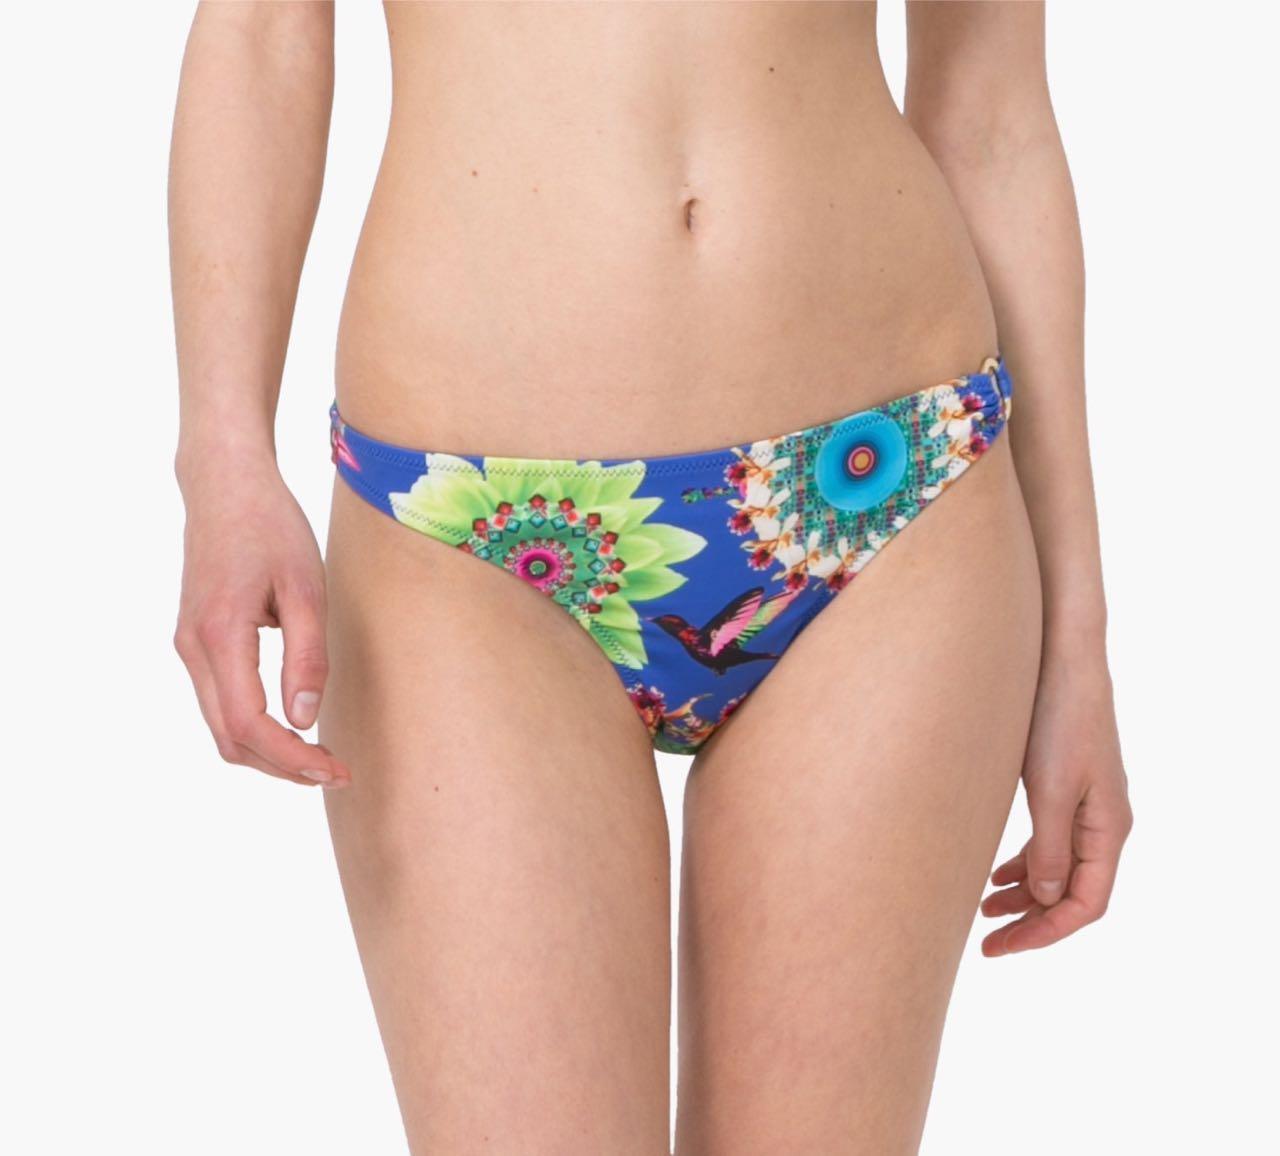 74M2WA1_5099 Desigual Swimwear Bikini Bottom Gala Buy Online